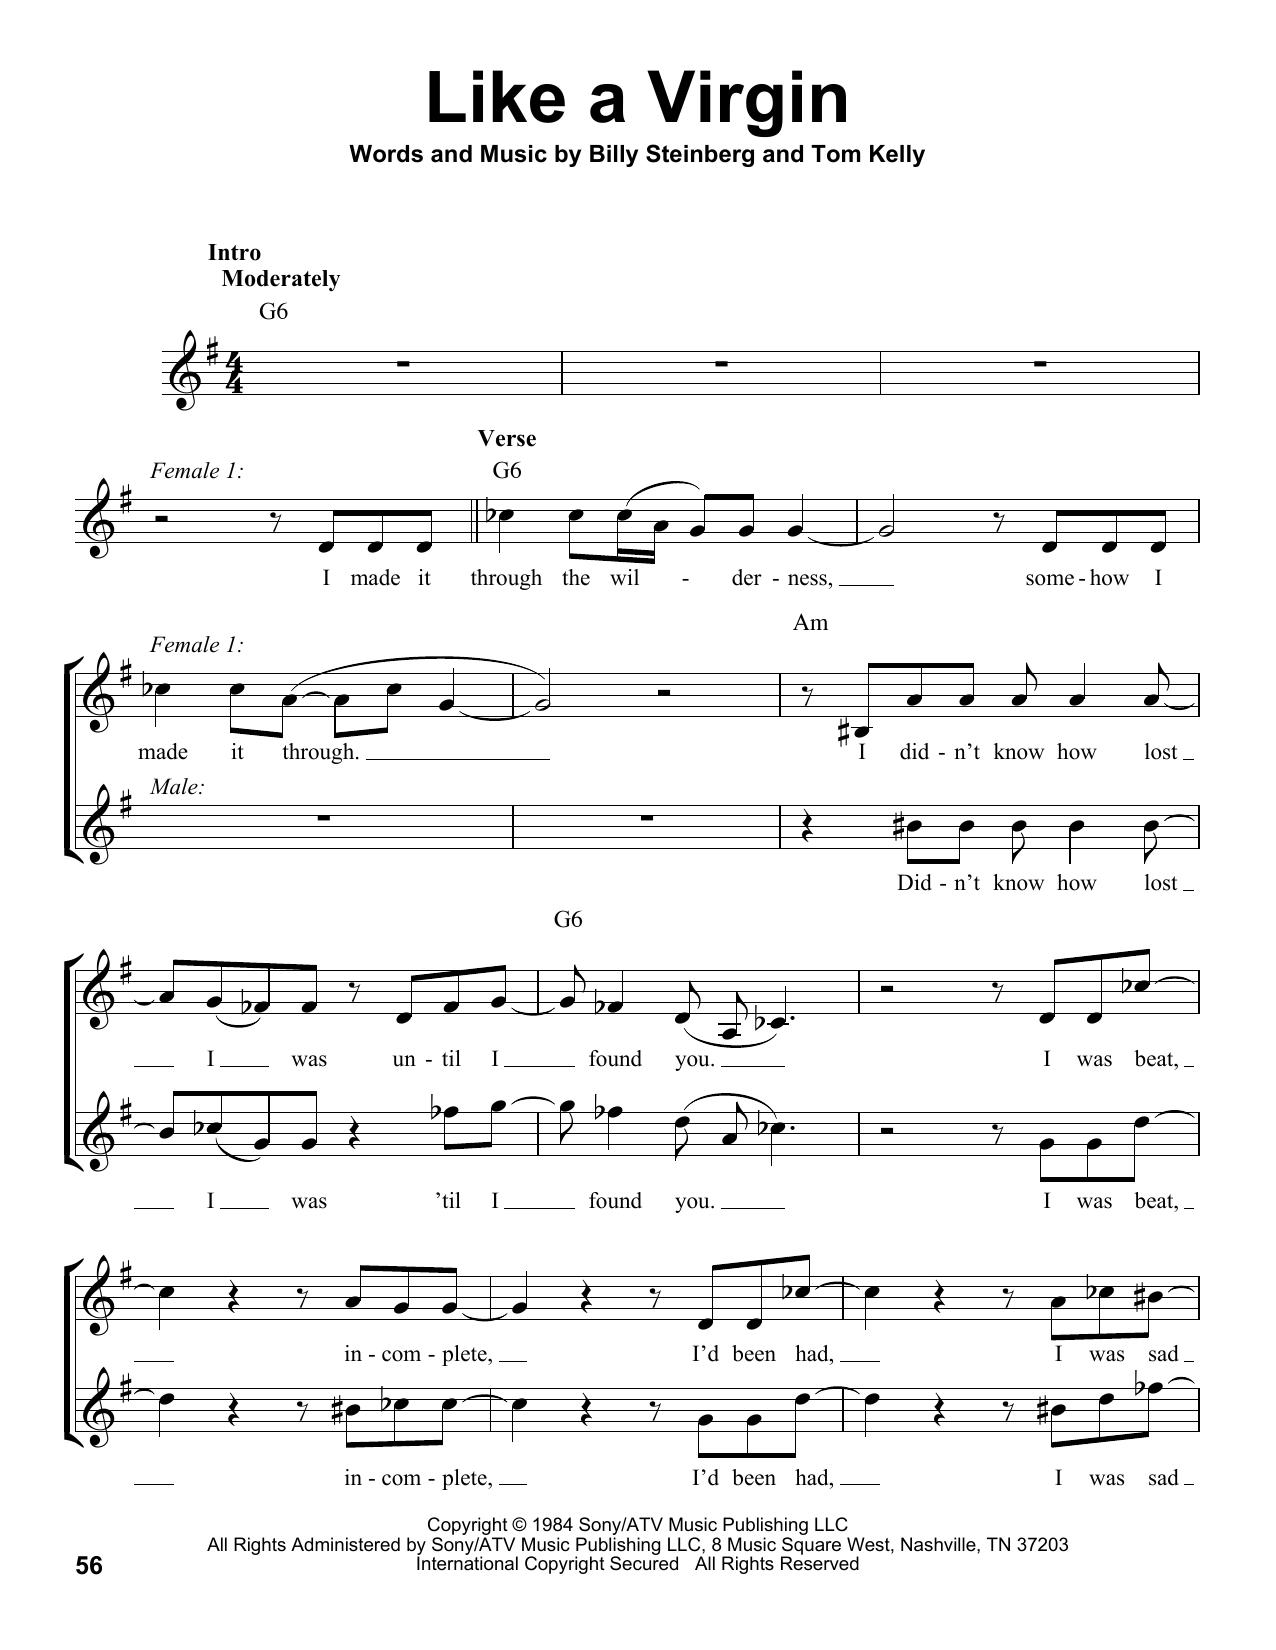 Glee Cast feat. Matthew Morrison, Jayma Mayes, Naya Rivera, Like A Virgin sheet music notes and chords. Download Printable PDF.